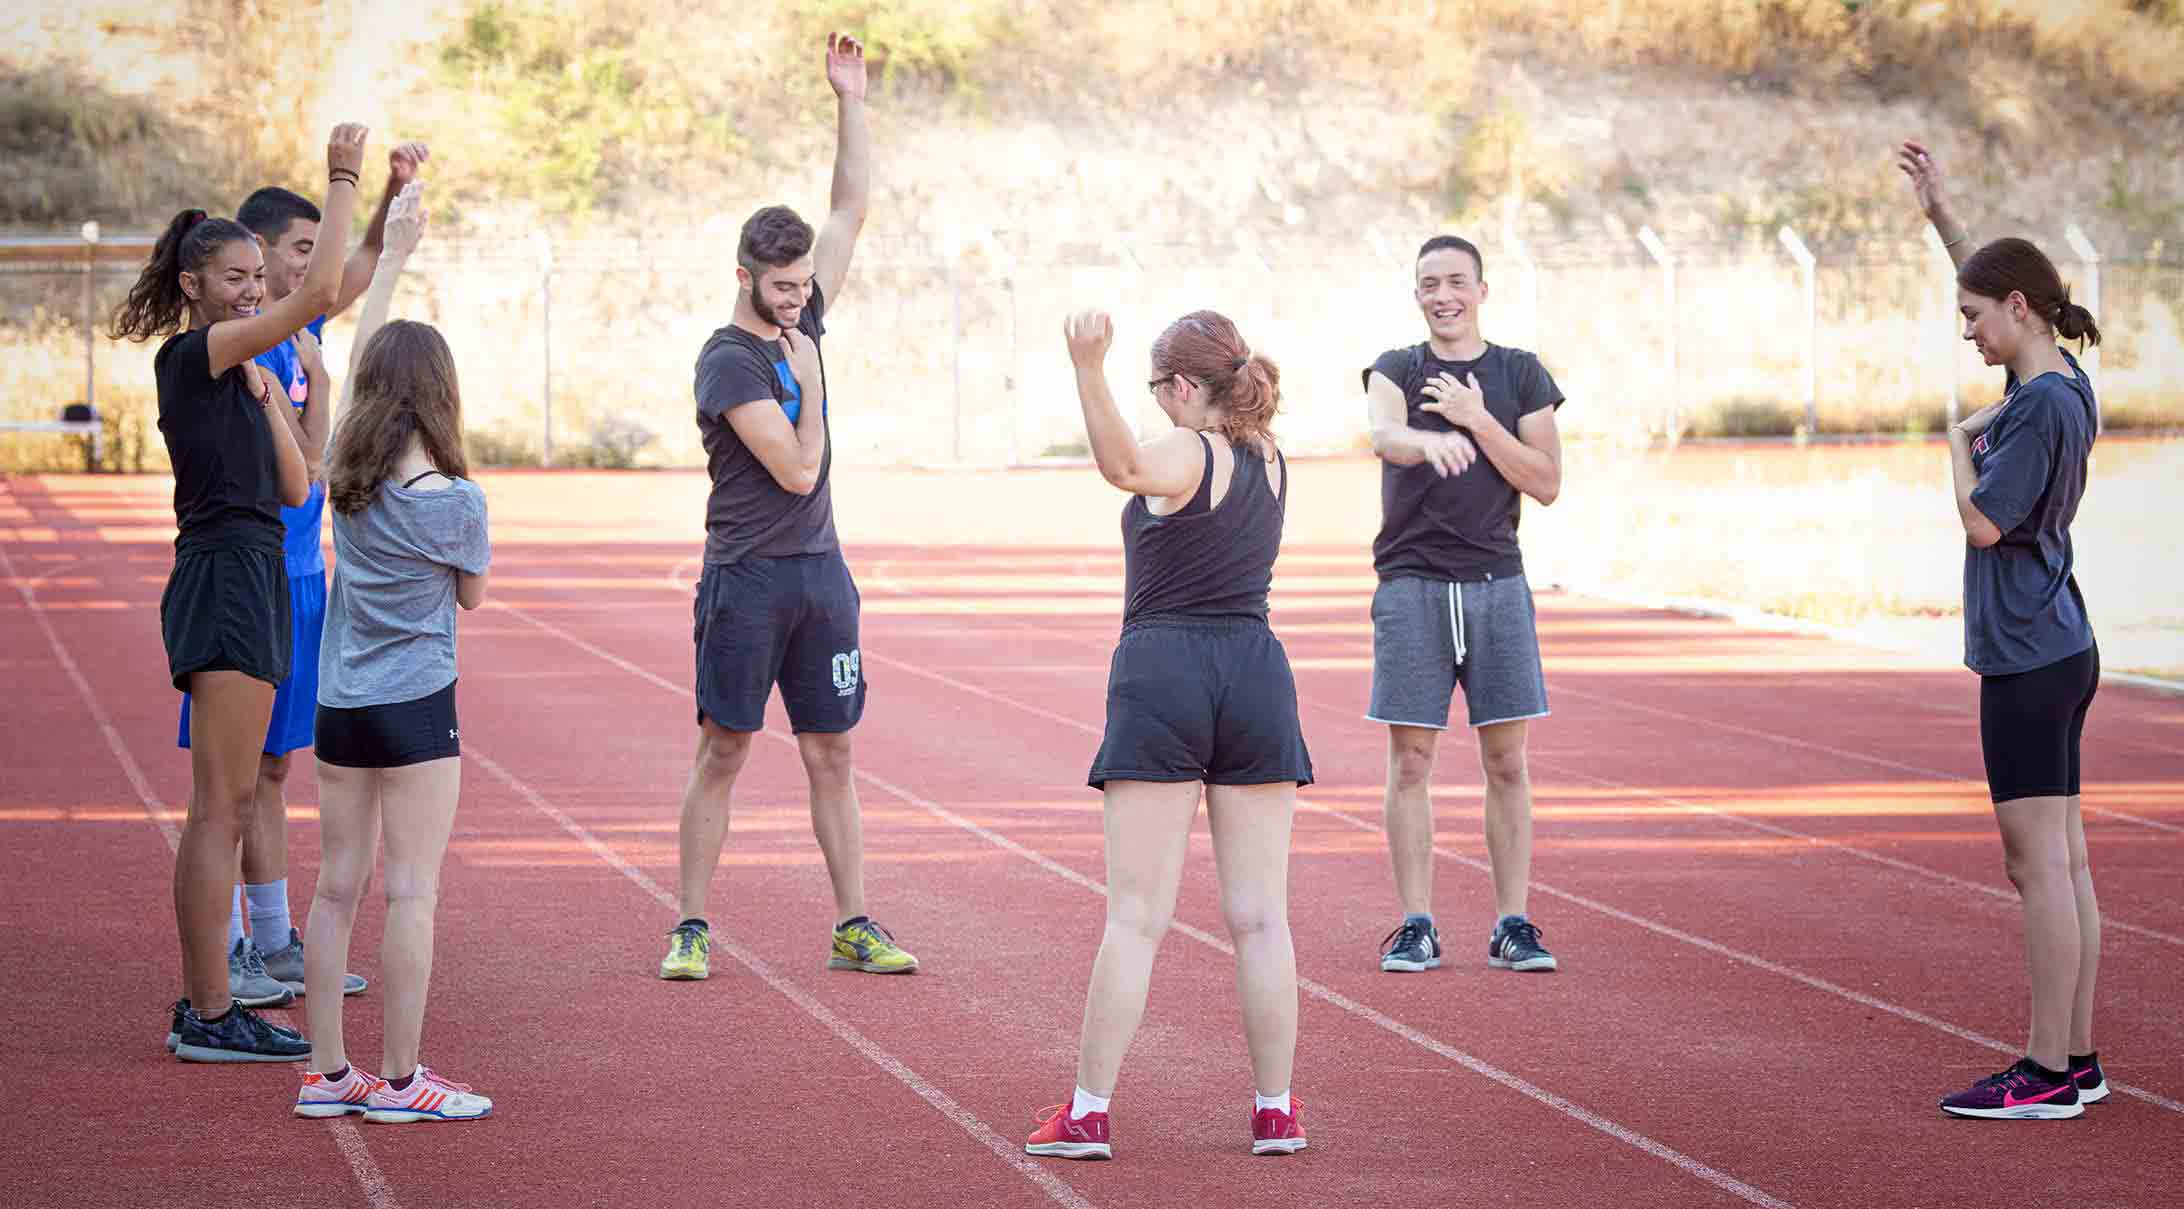 toloudis sports coach αθλητικη προετοιμασία θεσσαλονίκη